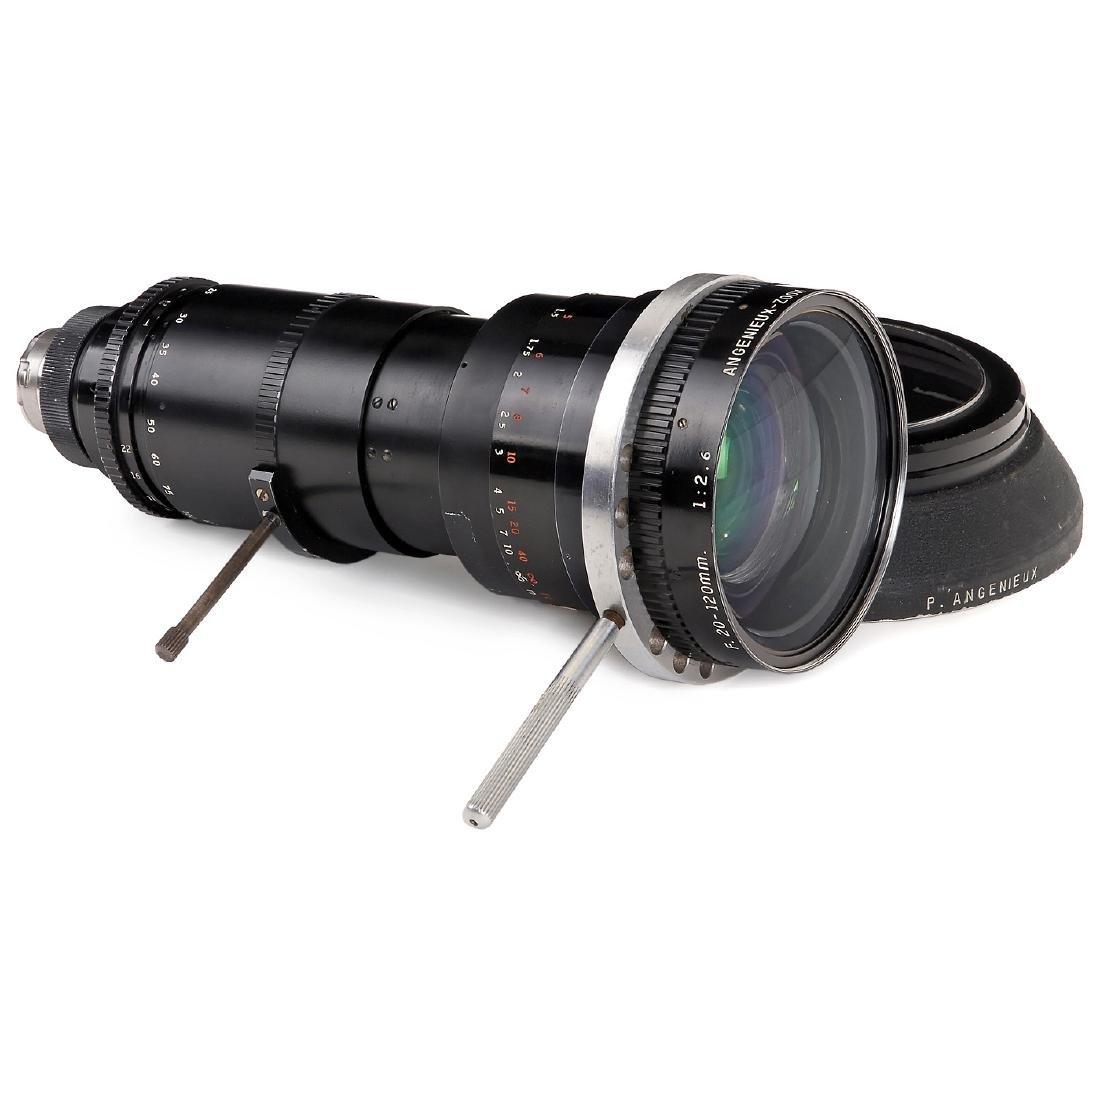 "Arriflex Zoom ""Angenieux 1:2,9/20-120 mm"", c. 1970"